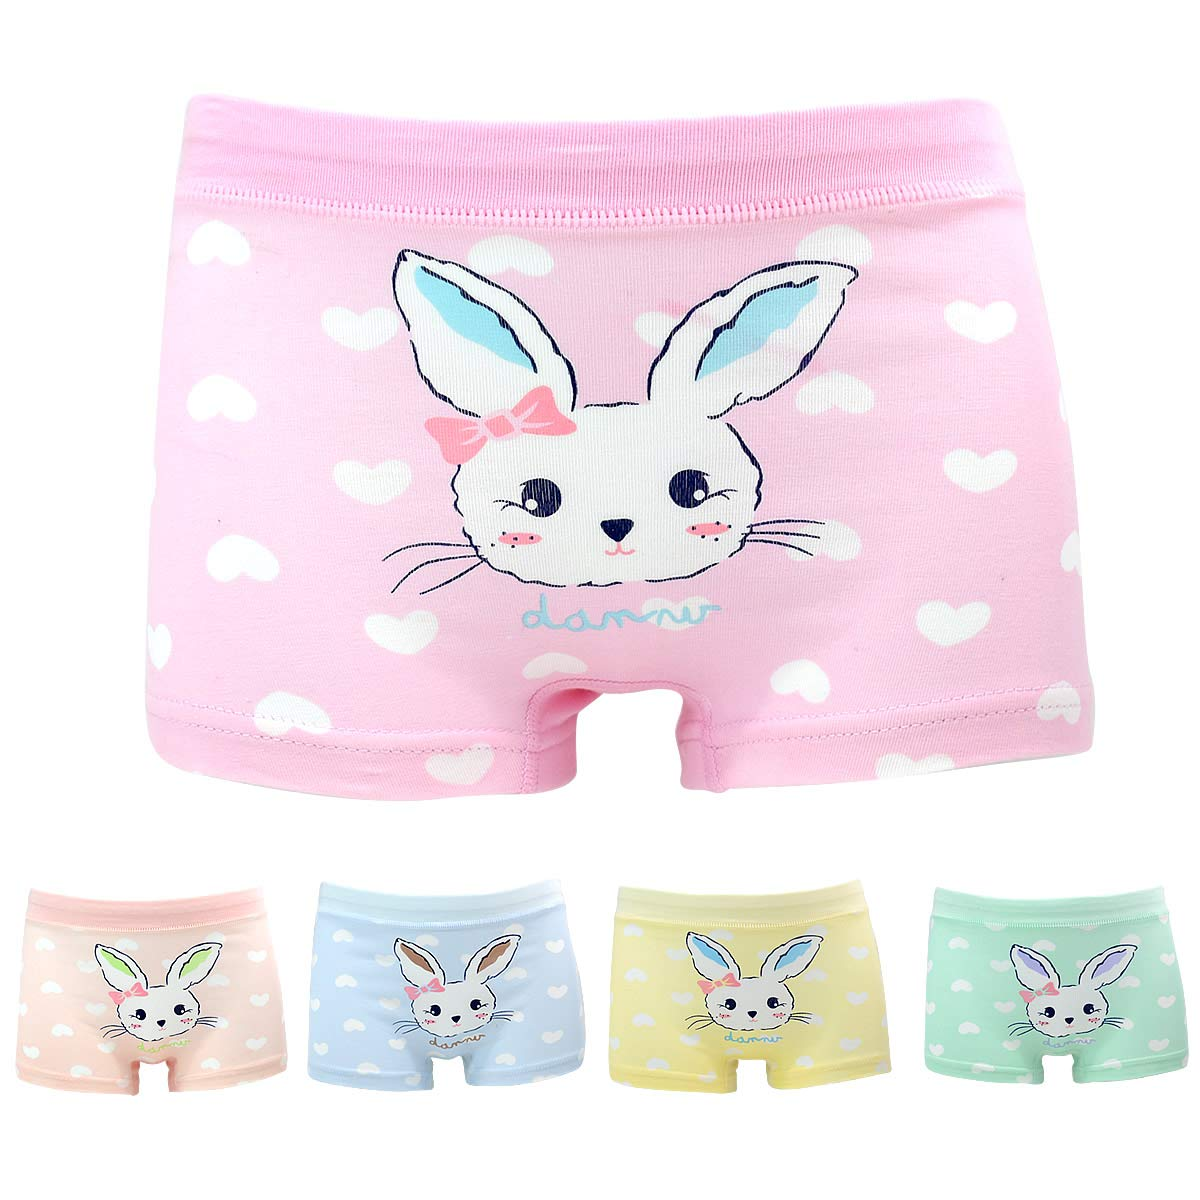 Allmeingeld Girls' Rabbit Panties Bunny Boyshort Cotton Underwear 5 Pack for 1-13 Years